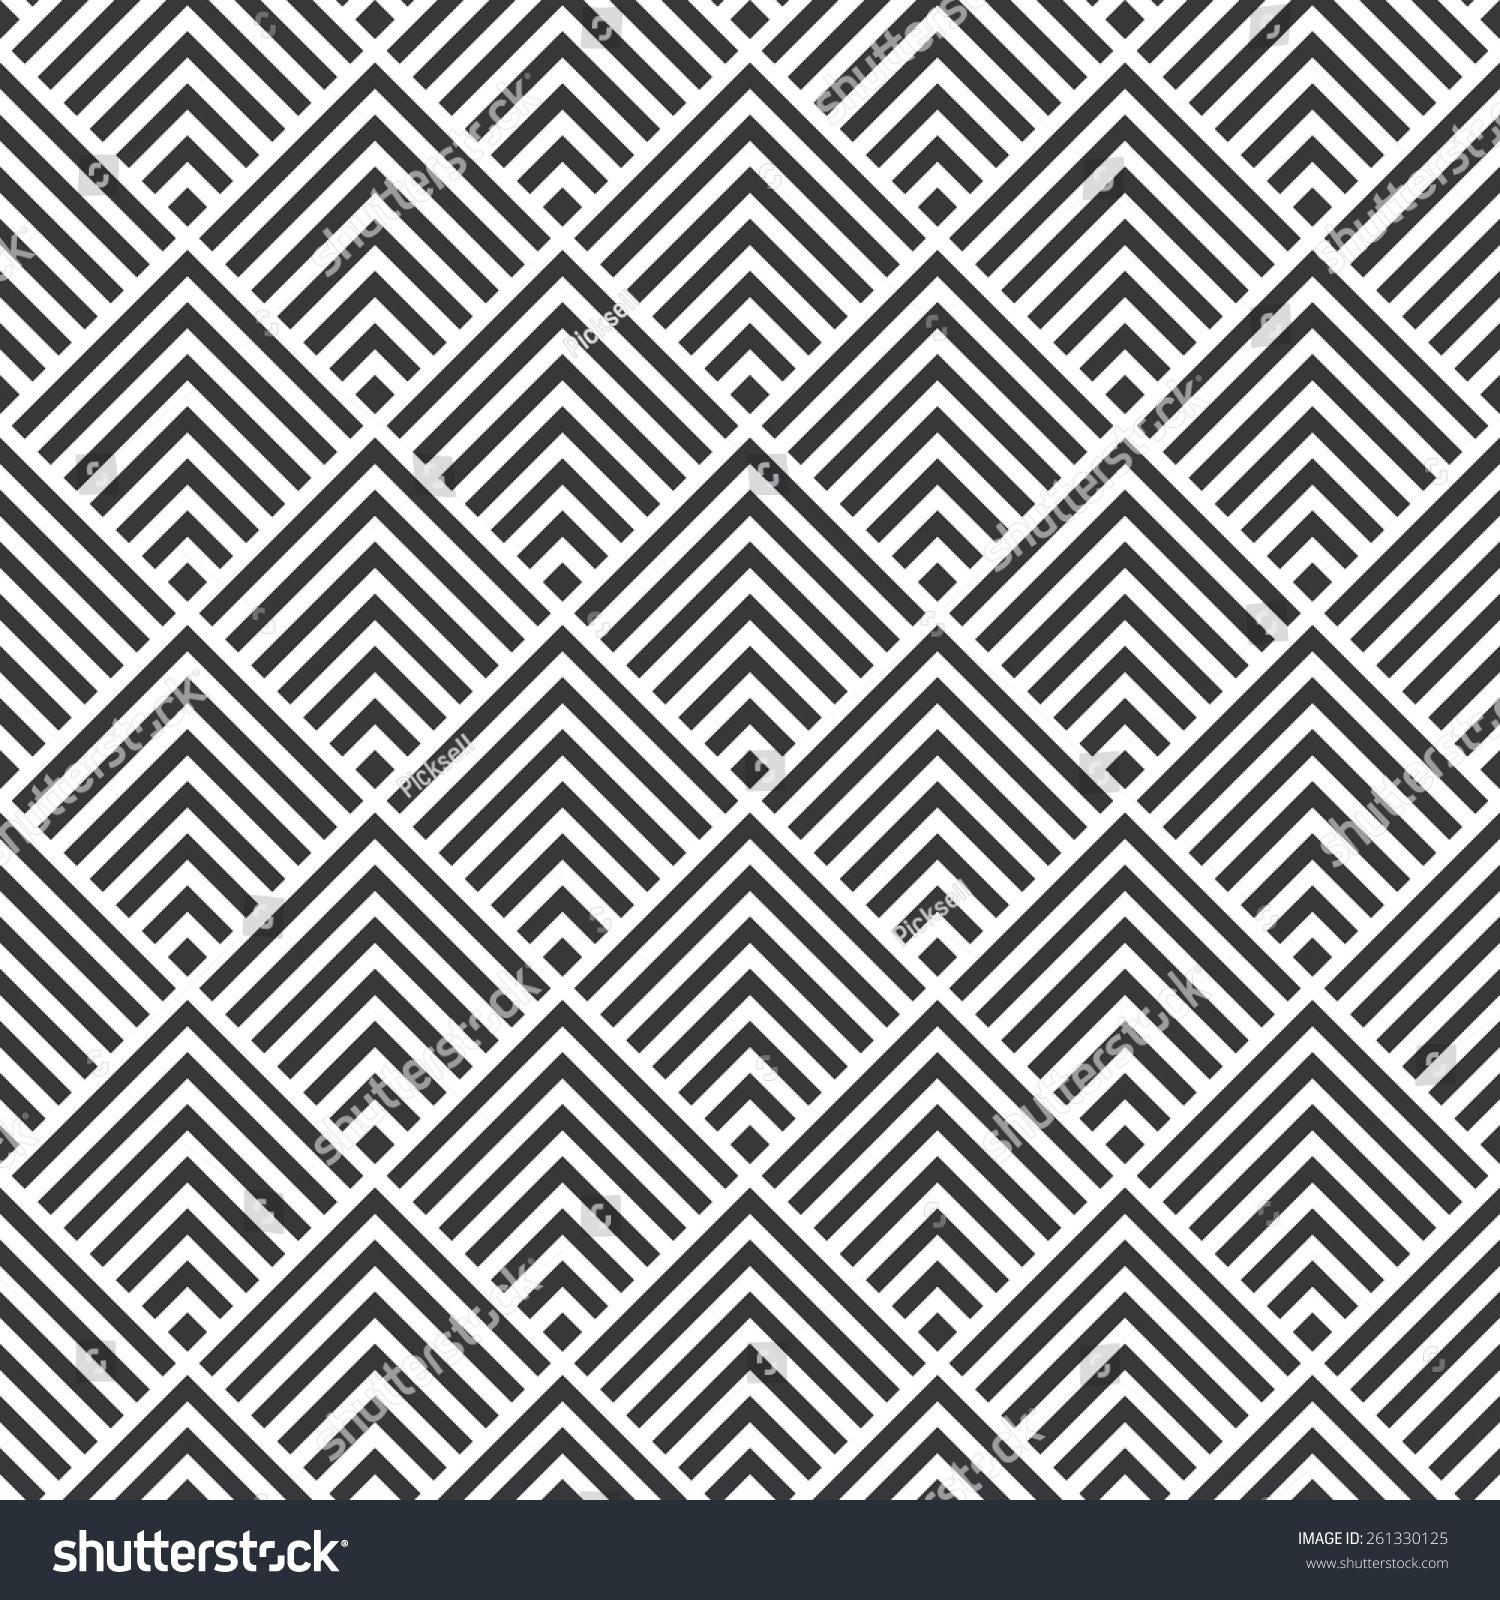 seamless art deco square chevrons pattern stock vector 261330125 shutterstock. Black Bedroom Furniture Sets. Home Design Ideas